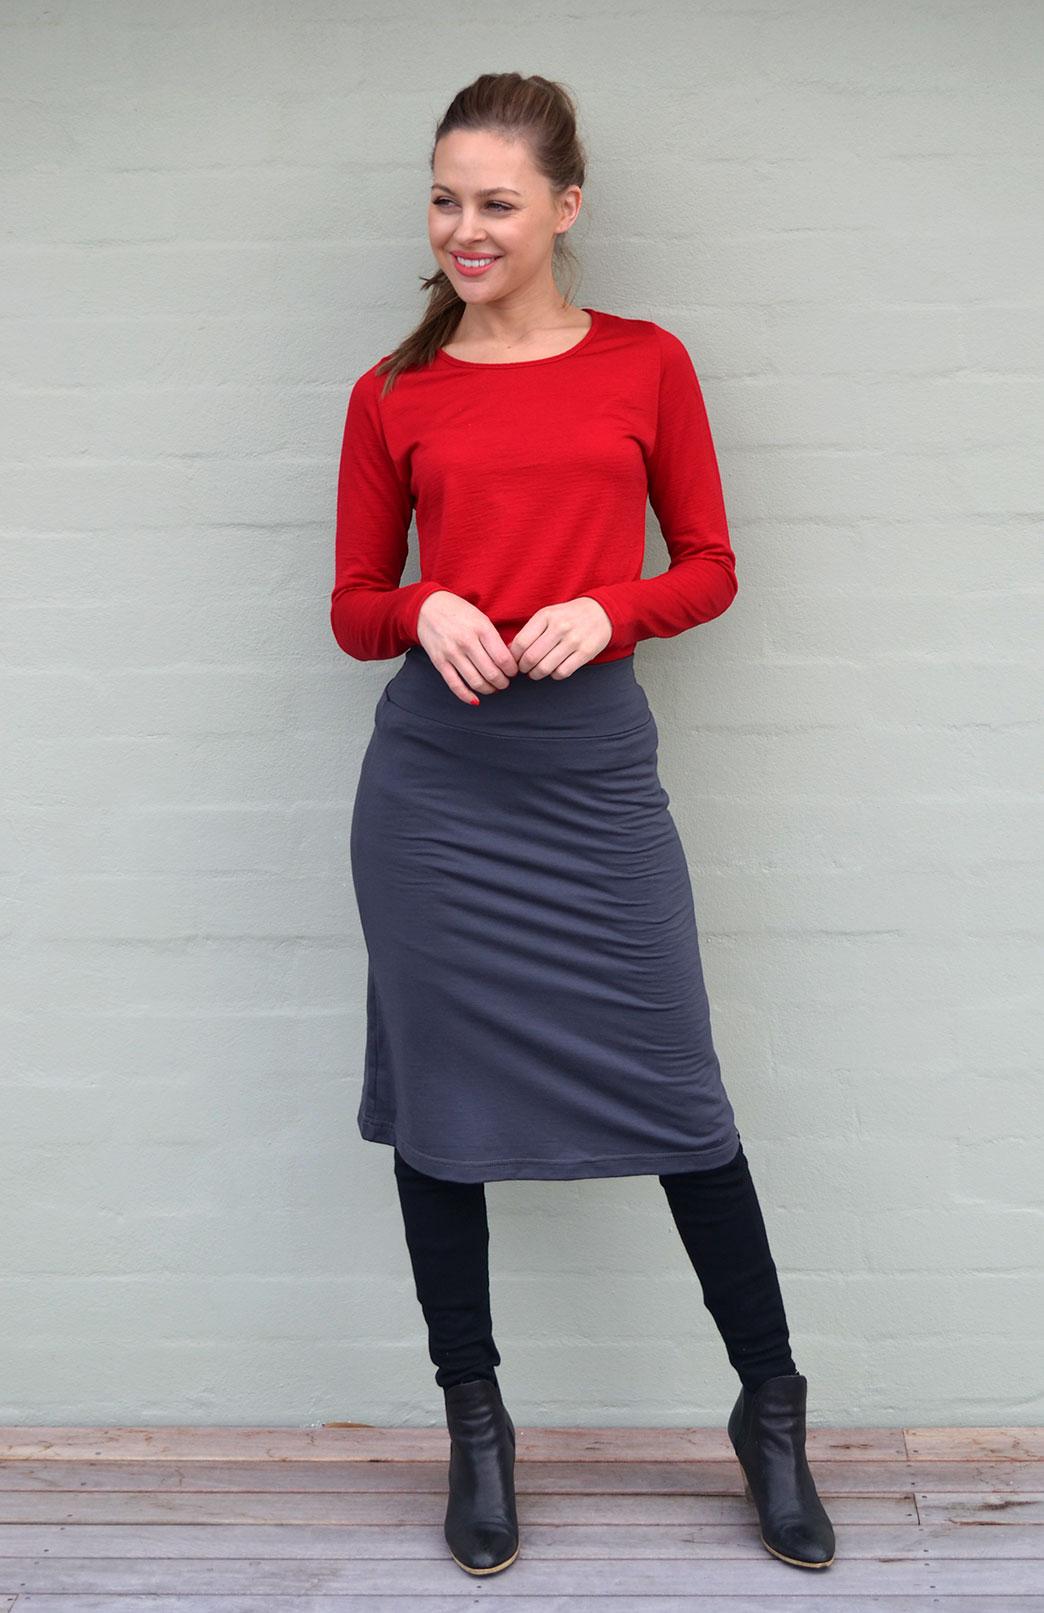 A-line Skirt - Women's Steel Grey Wool A-Line Skirt with elastic waistband - Smitten Merino Tasmania Australia